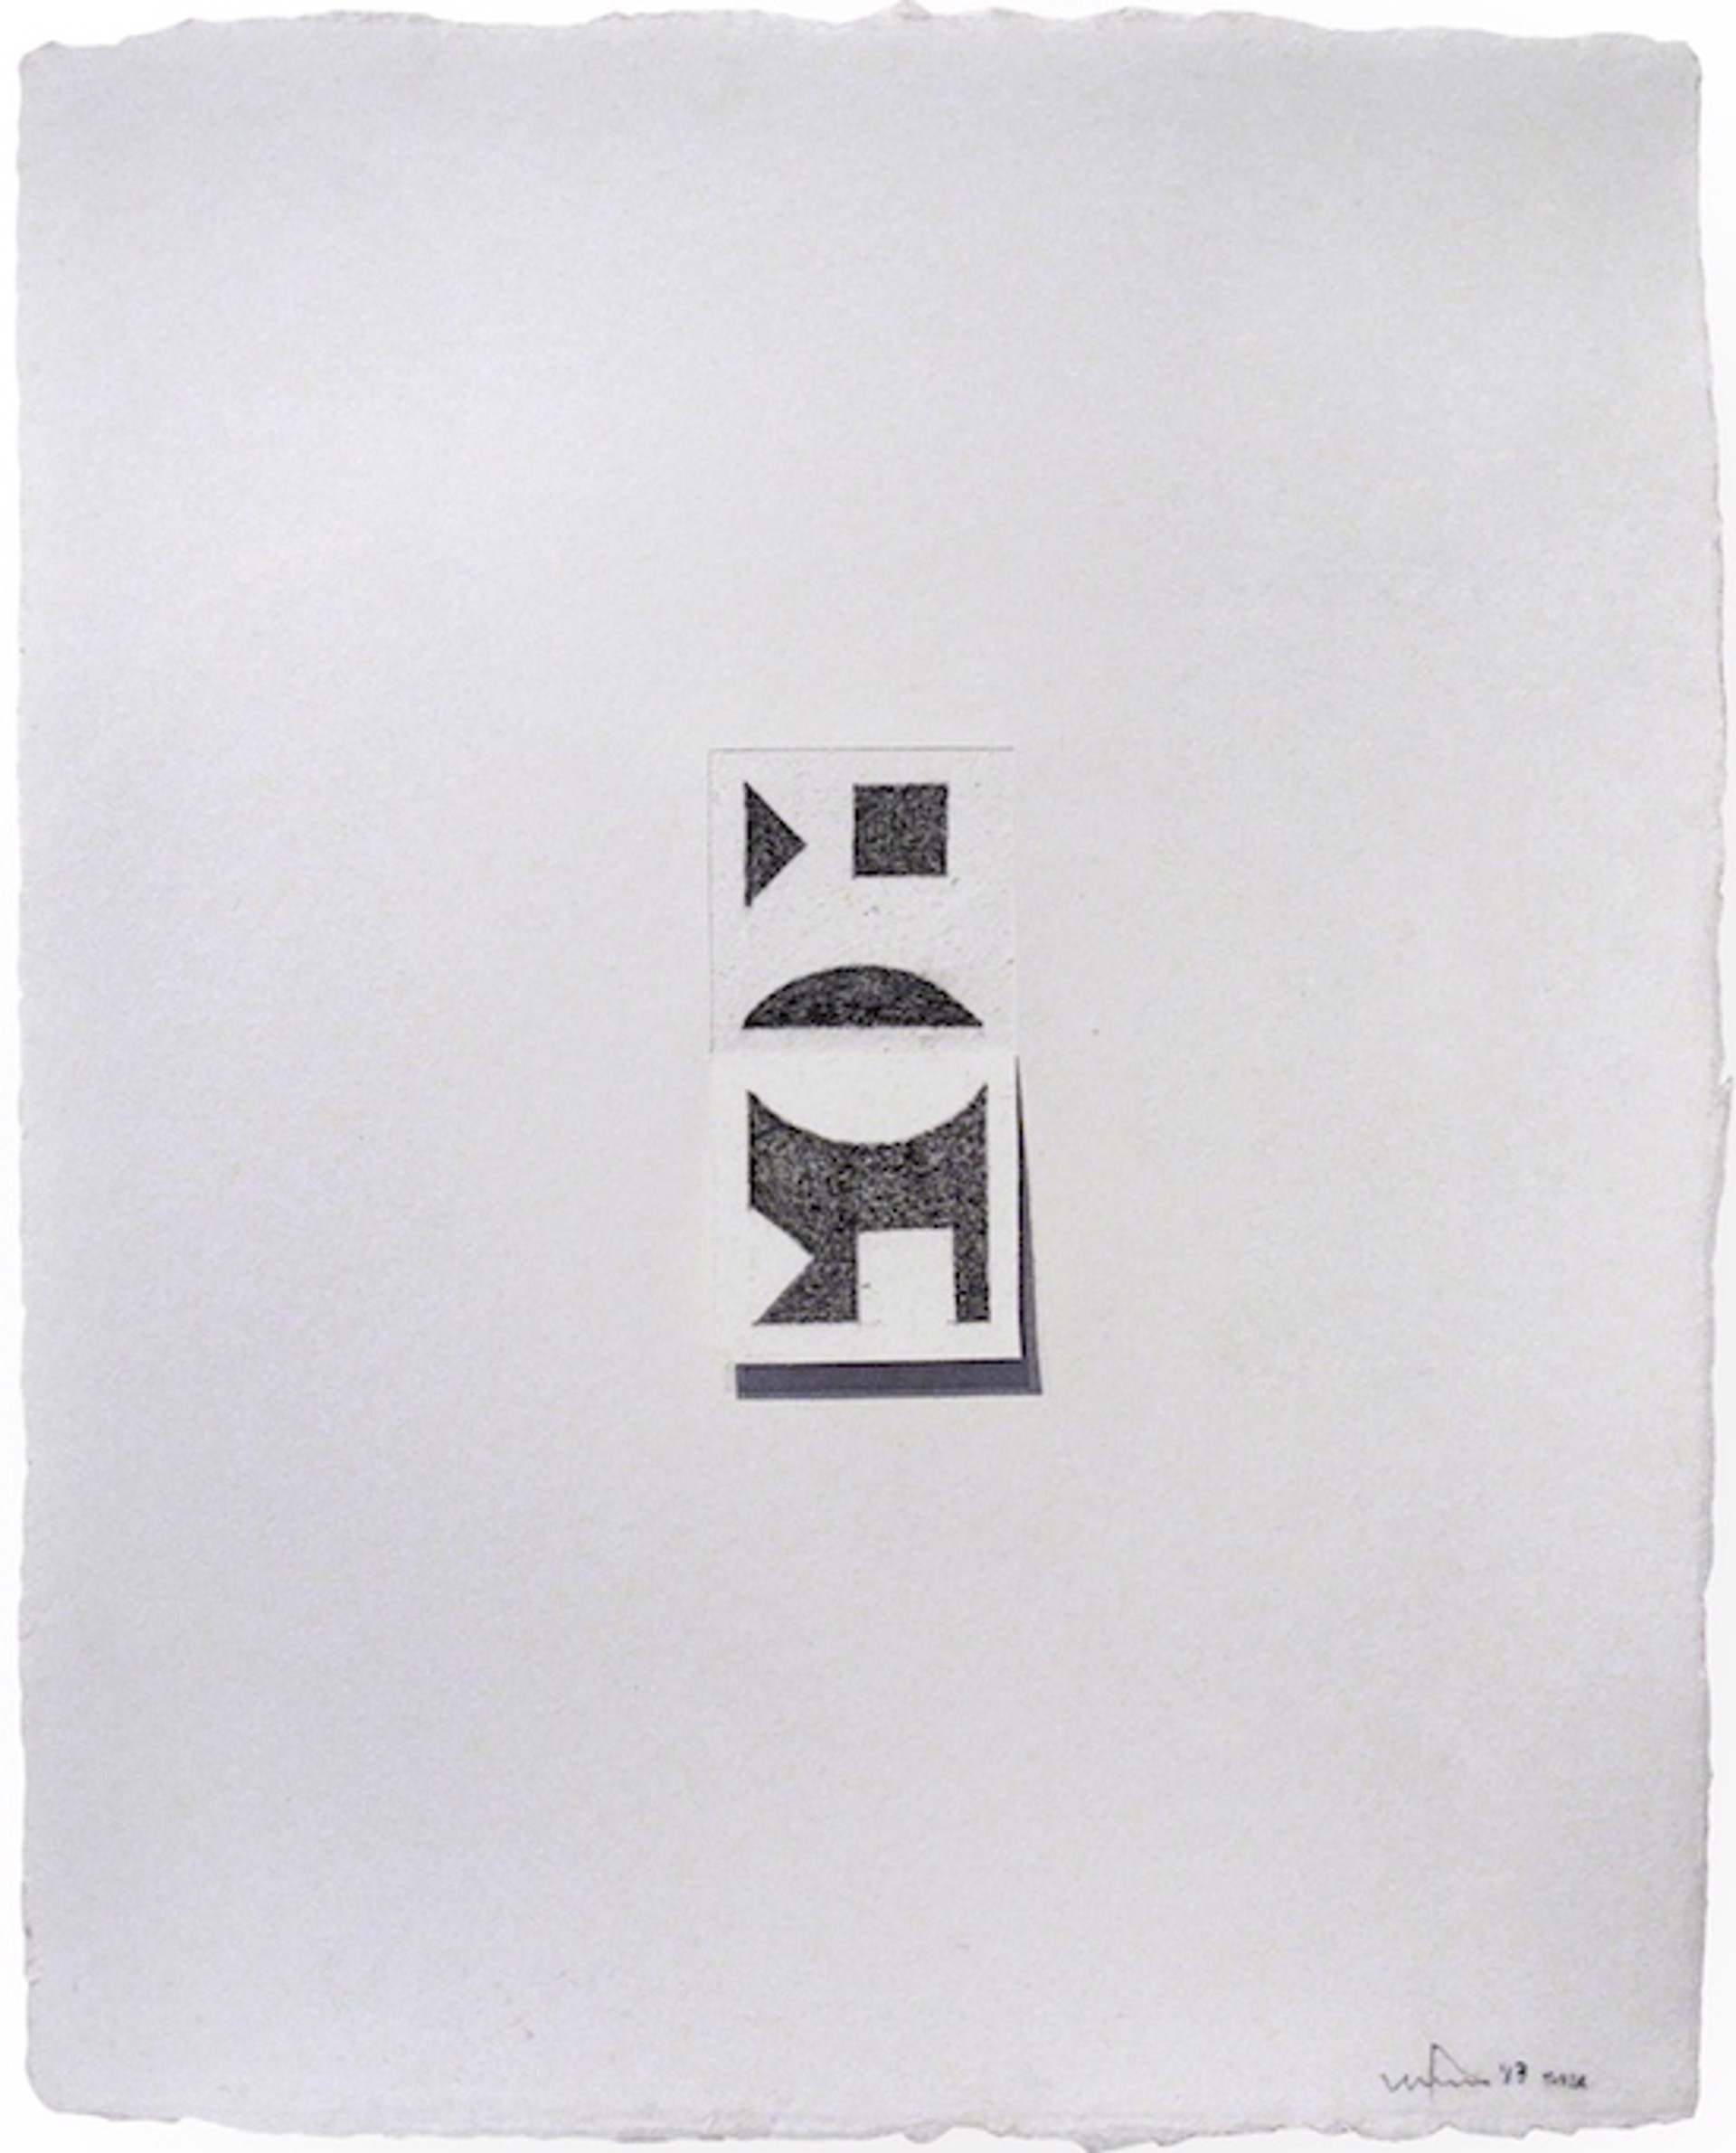 Untitled (SMA IX) by William Fares